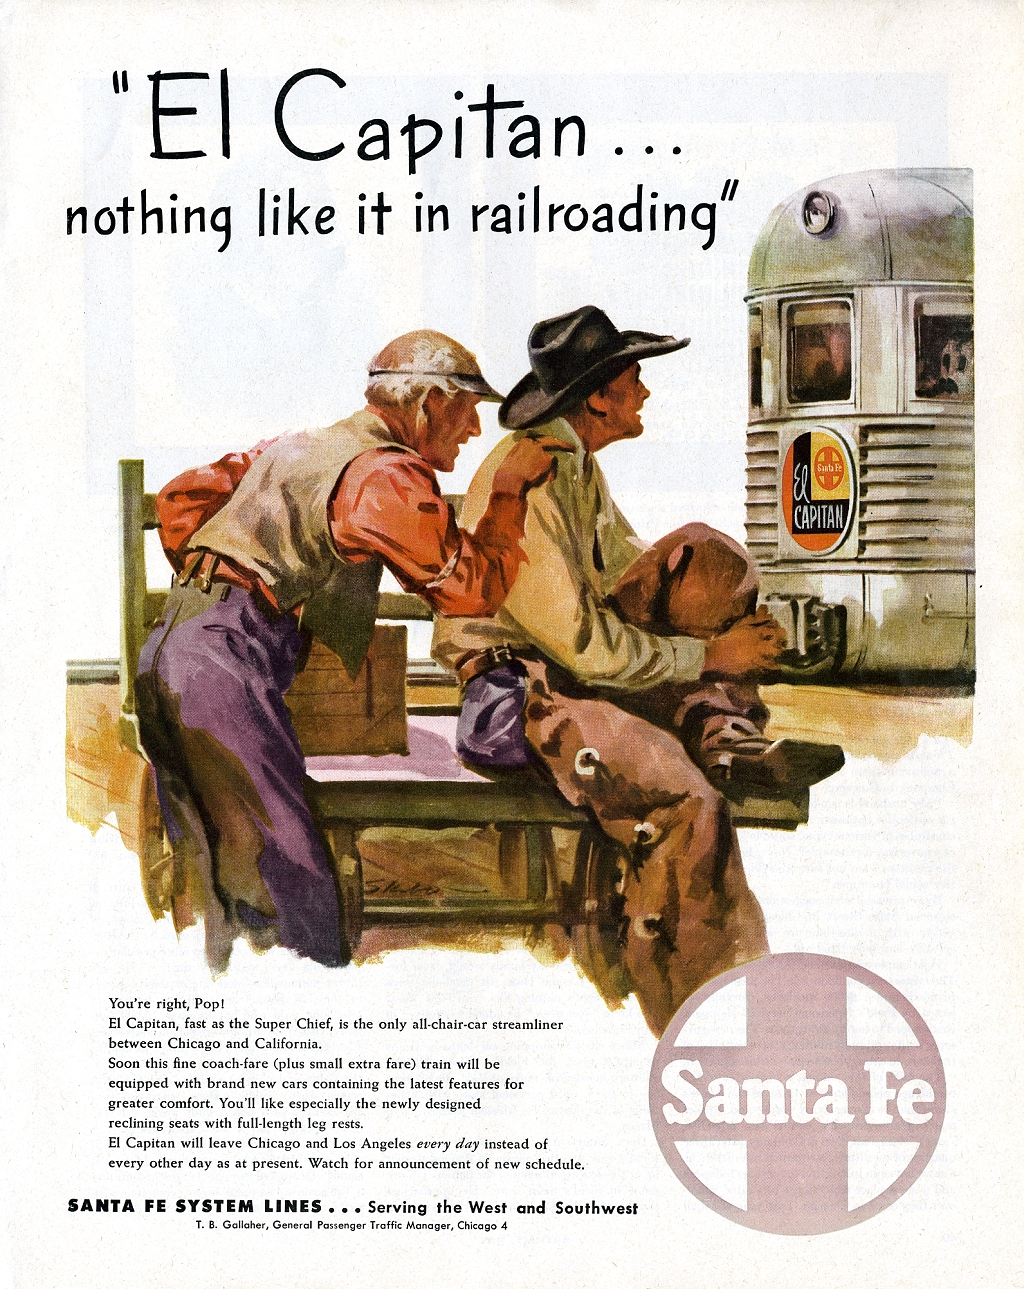 Santa Fe System Lines (Atchison, Topeka and Santa Fe Railway) - 1953